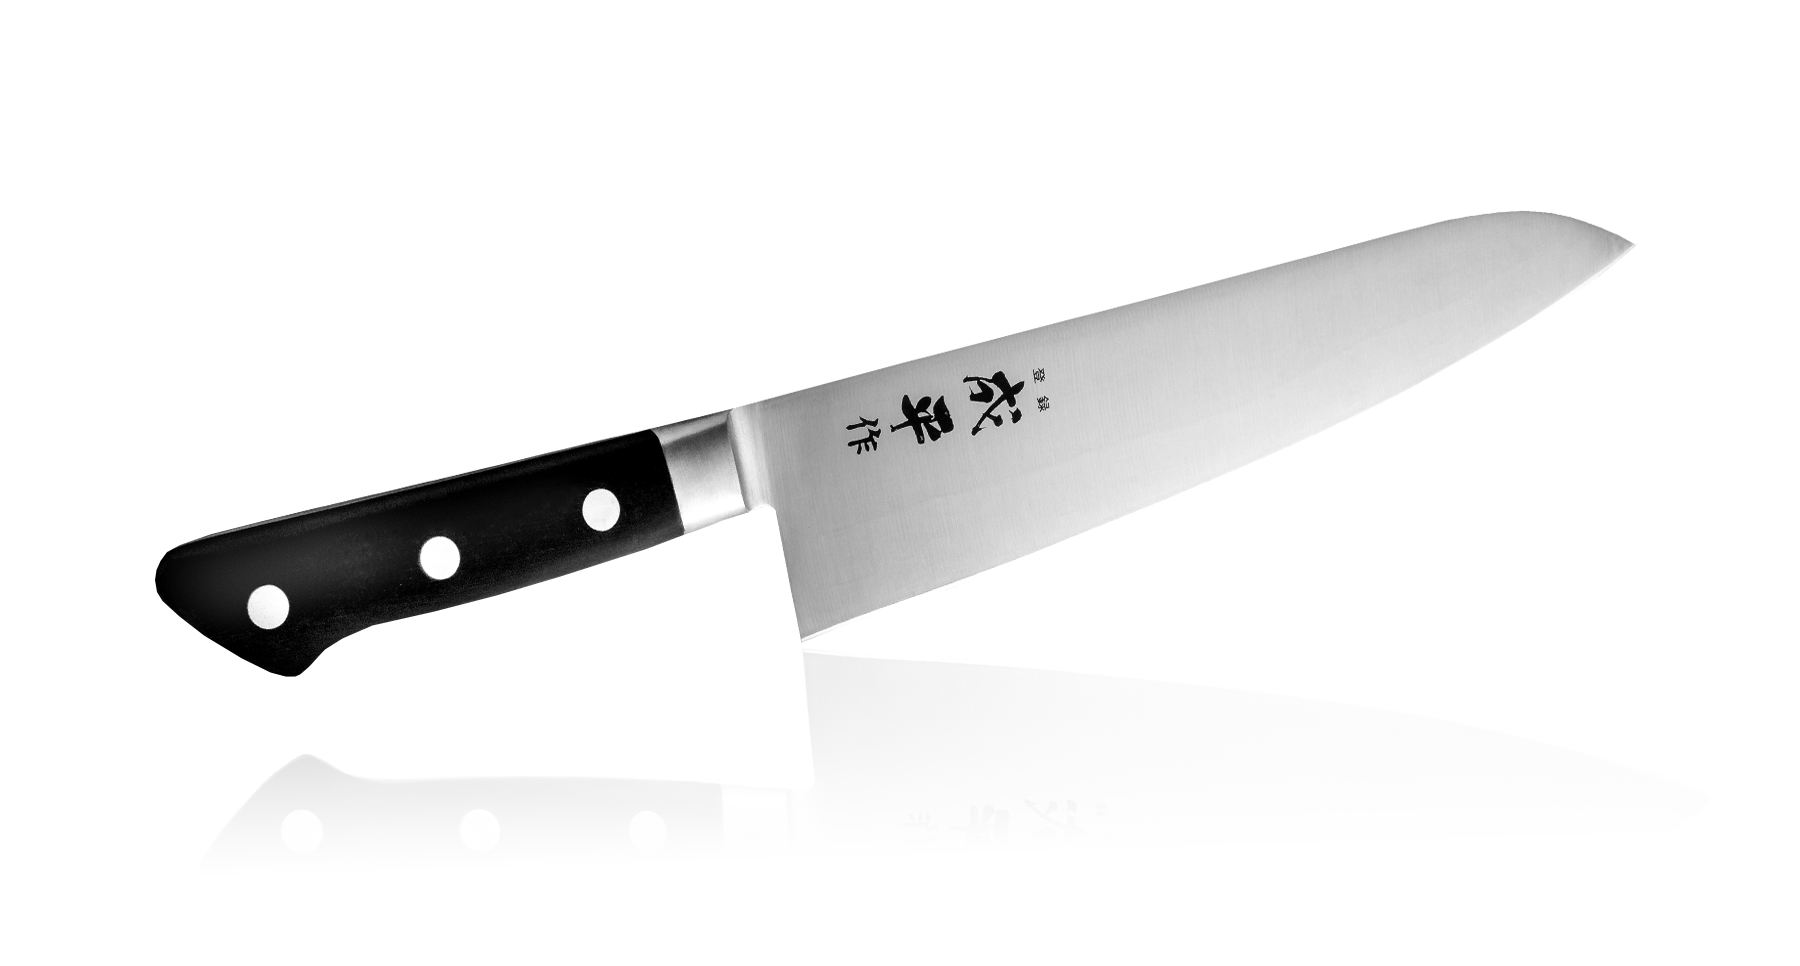 Нож Шефа Narihira 240 мм, сталь AUS-8